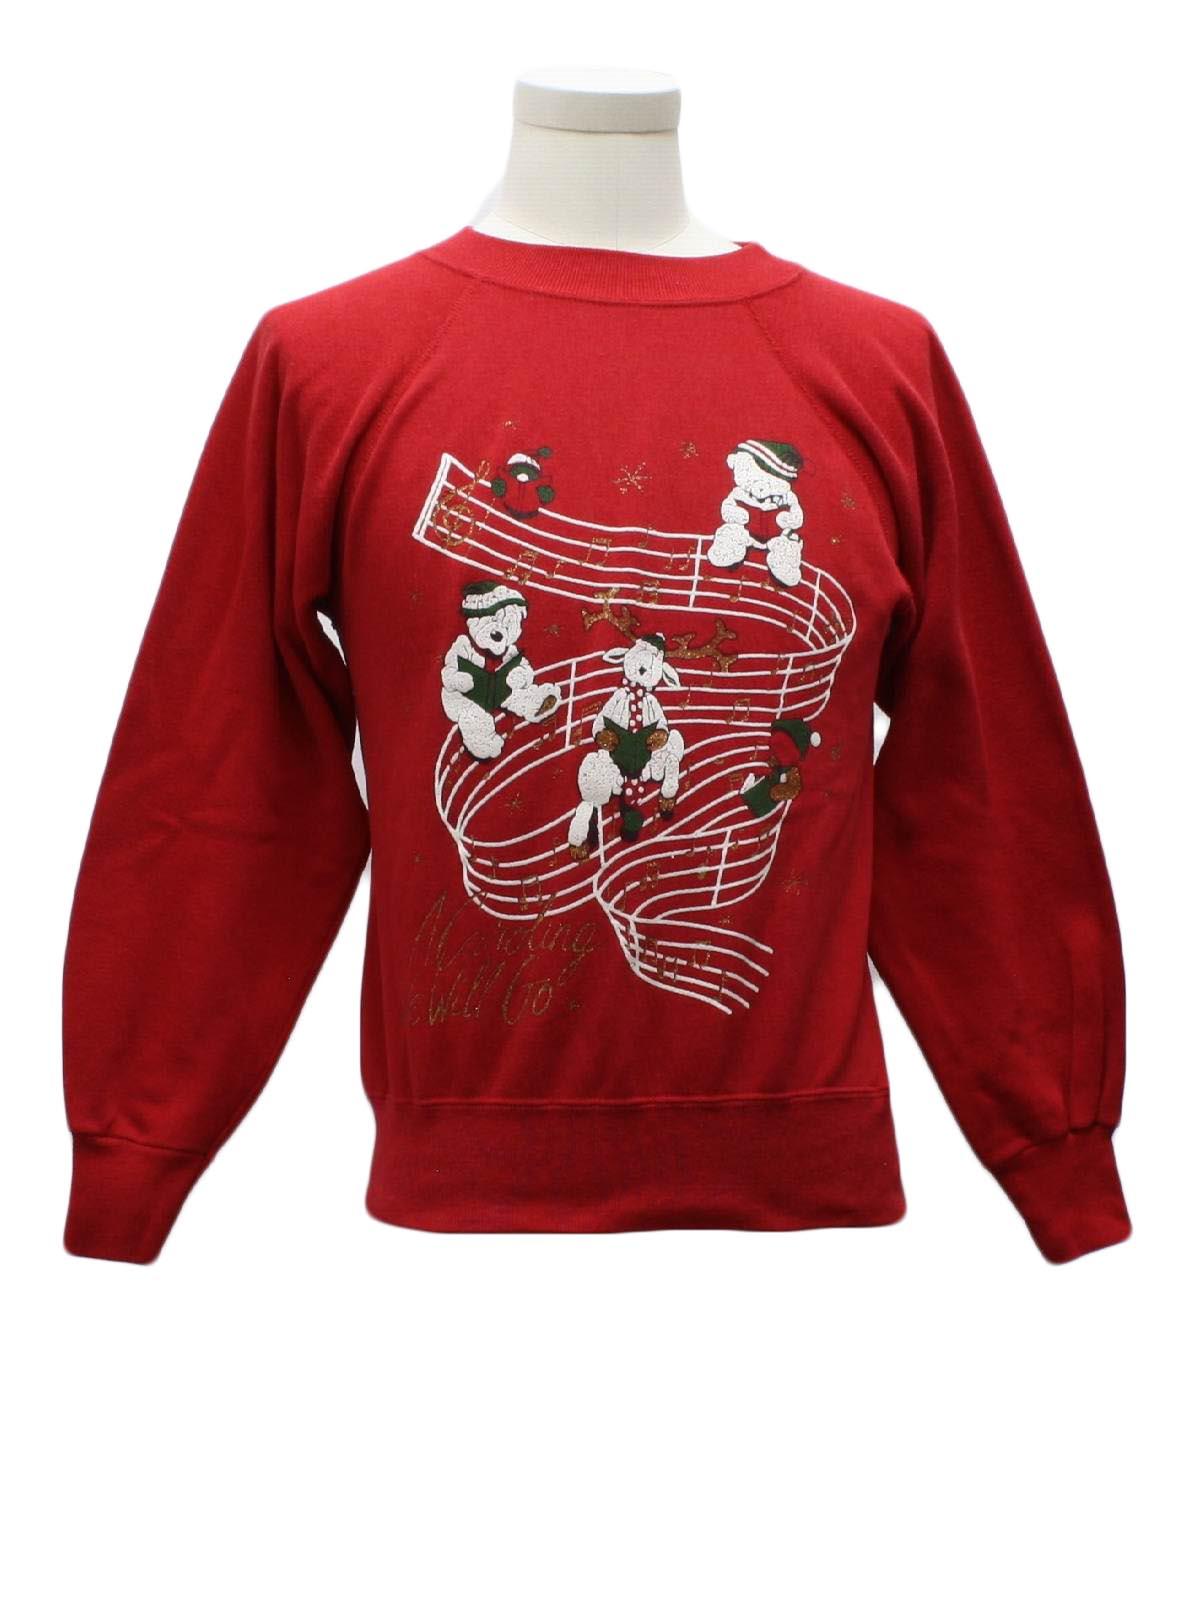 1980's Ultra Sweats Womens/Girls Ugly Christmas Sweatshirt $26.00 Not in stock. Item No. 241580